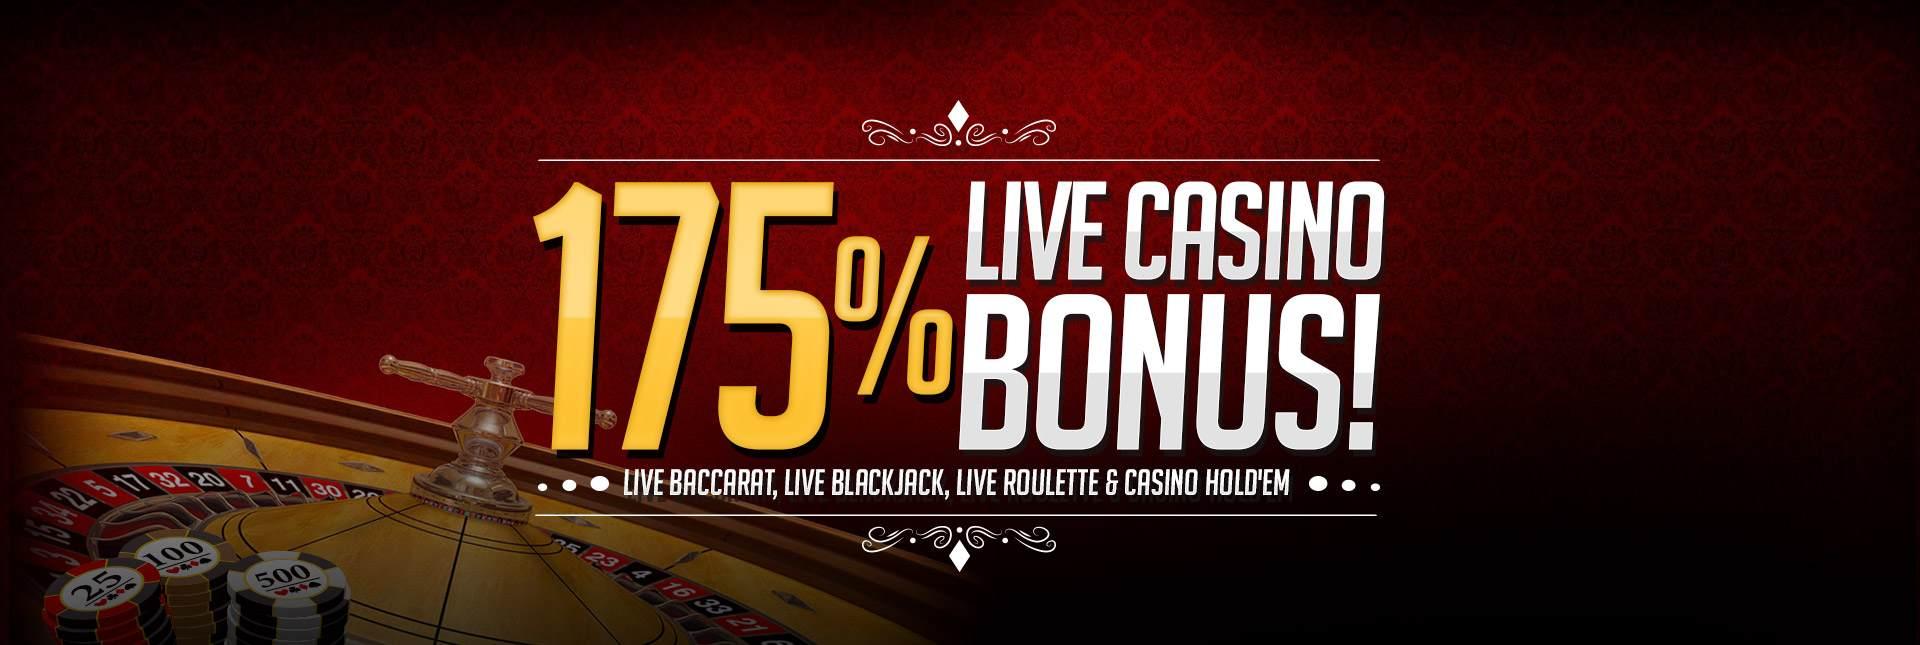 175% Live Casino Bonus!